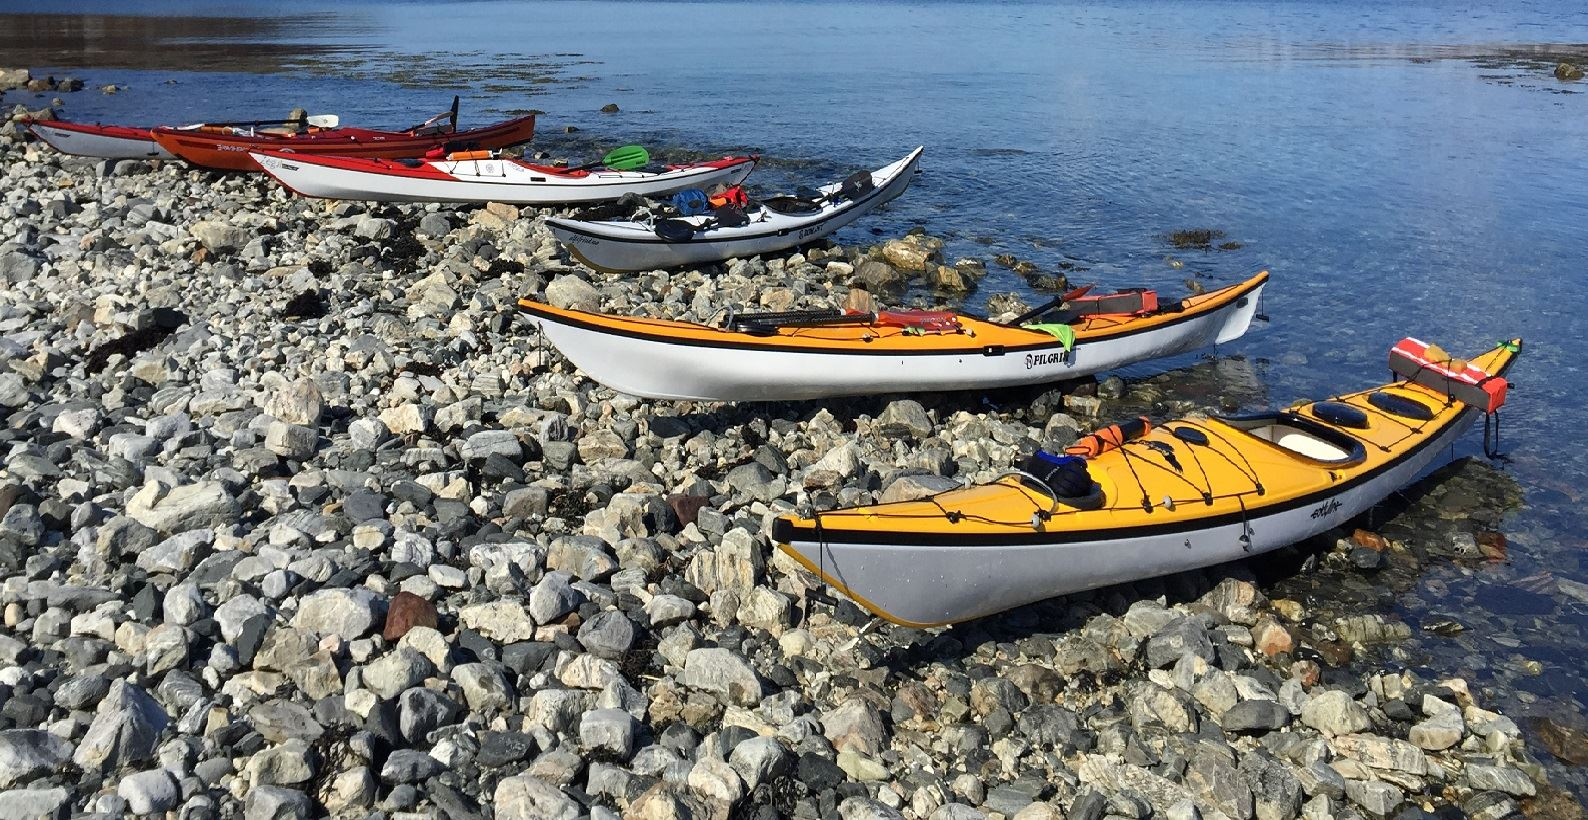 Kajakk dagstur på Kvaløya – Elements Arctic Camp